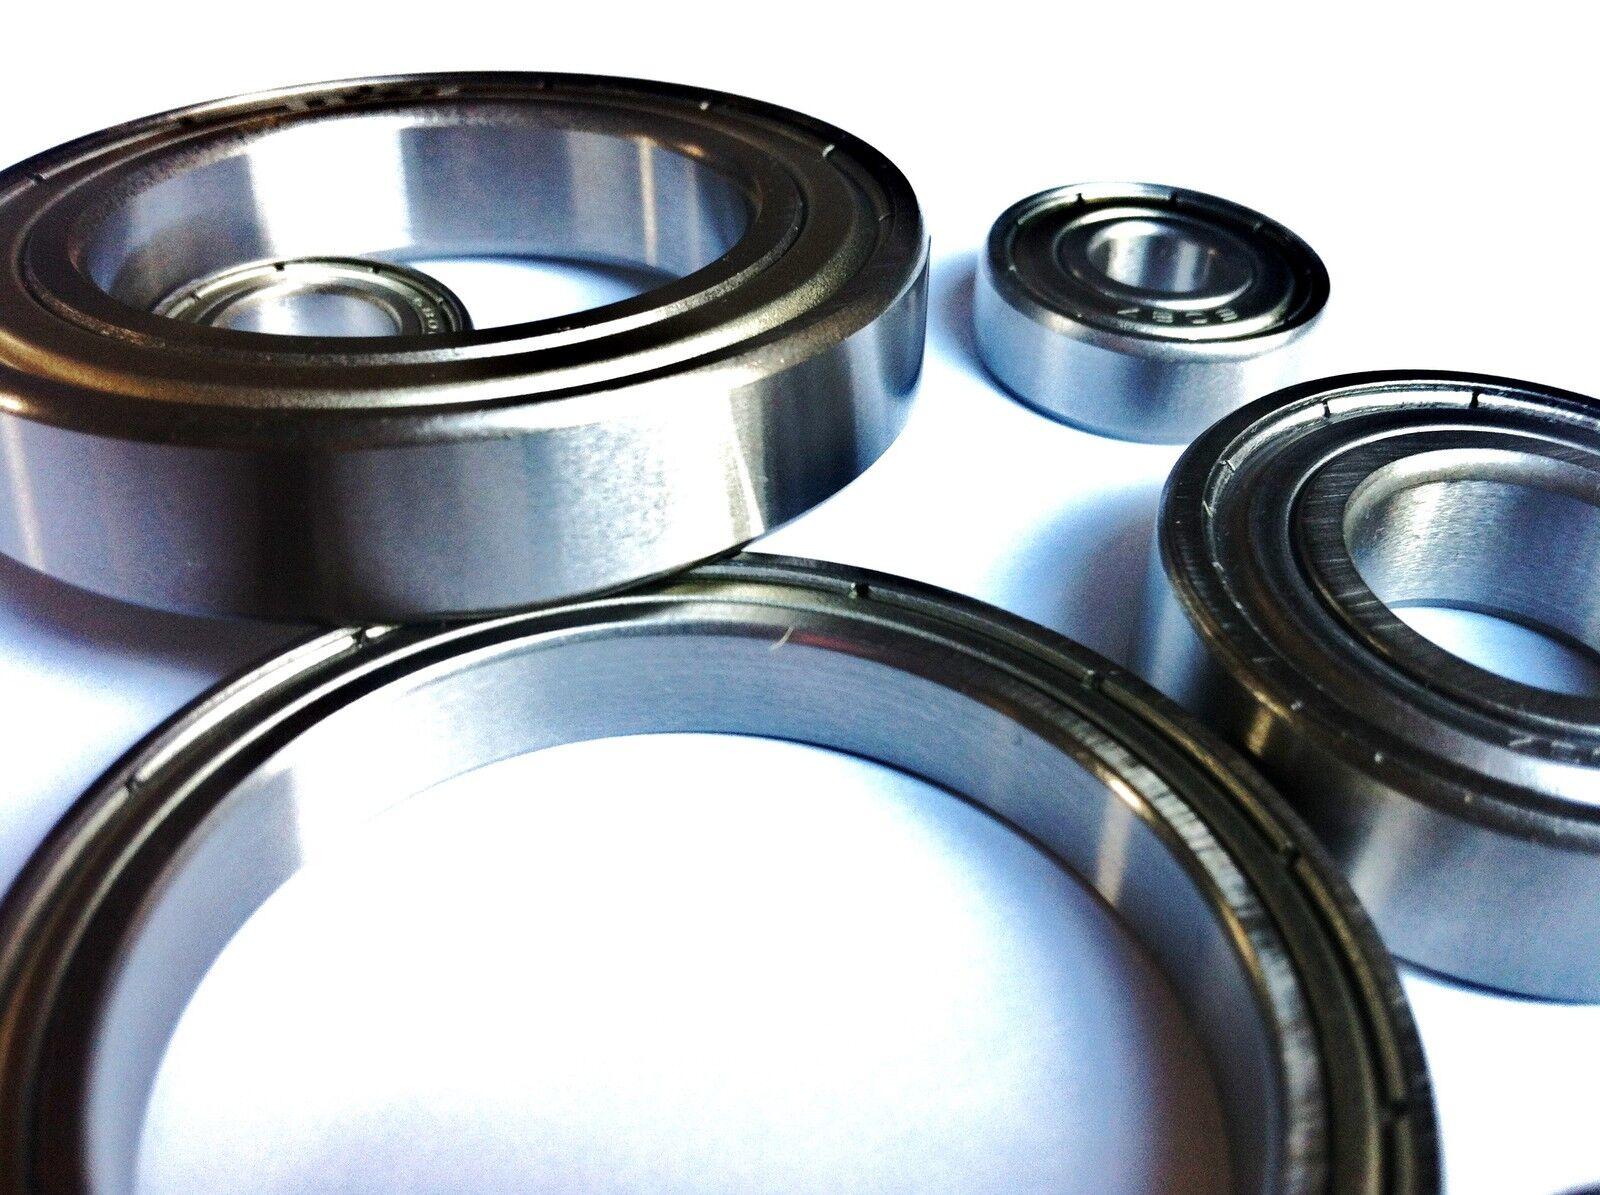 Full Range 61700.61800.61900 zz Shielded Thin Section HIGH PERFORMANCE PERFORMANCE PERFORMANCE Bearings 1c77a3